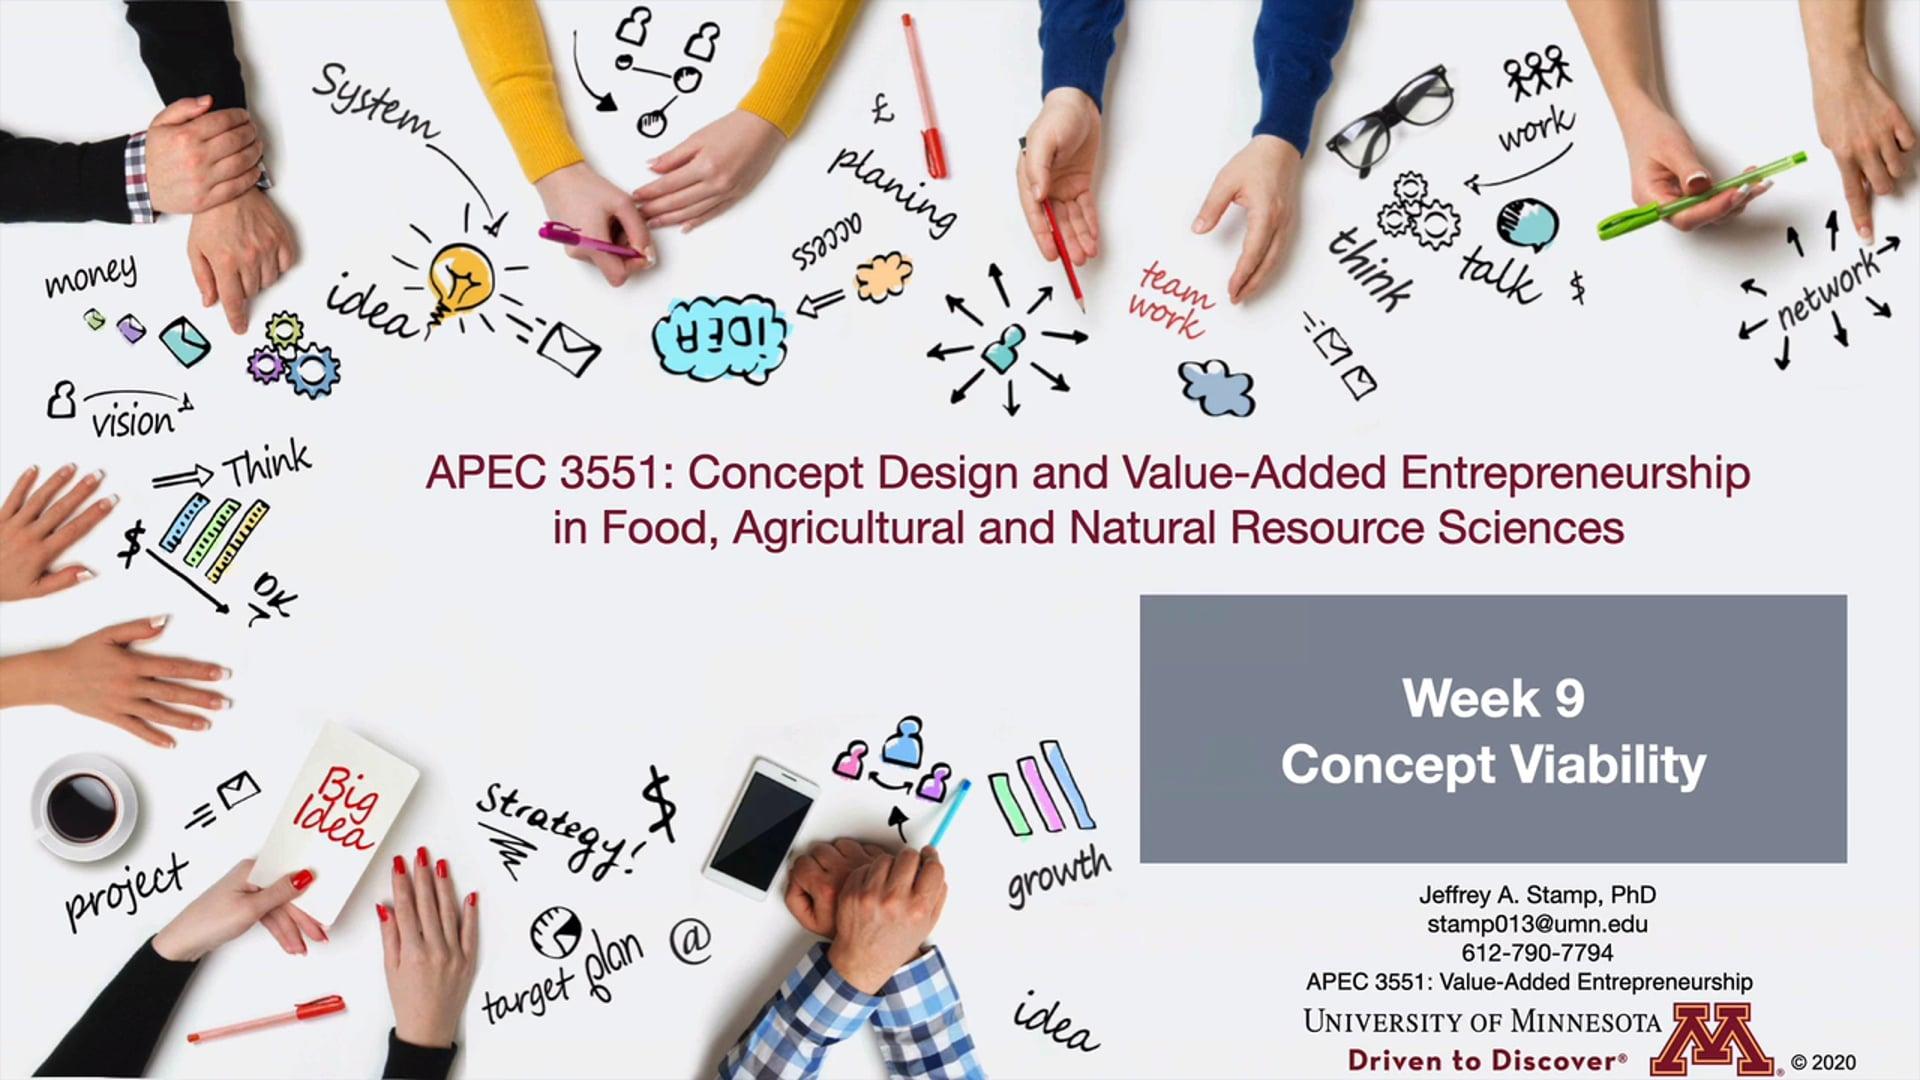 APEC 3551 F20 Viability Week 9 Video 1